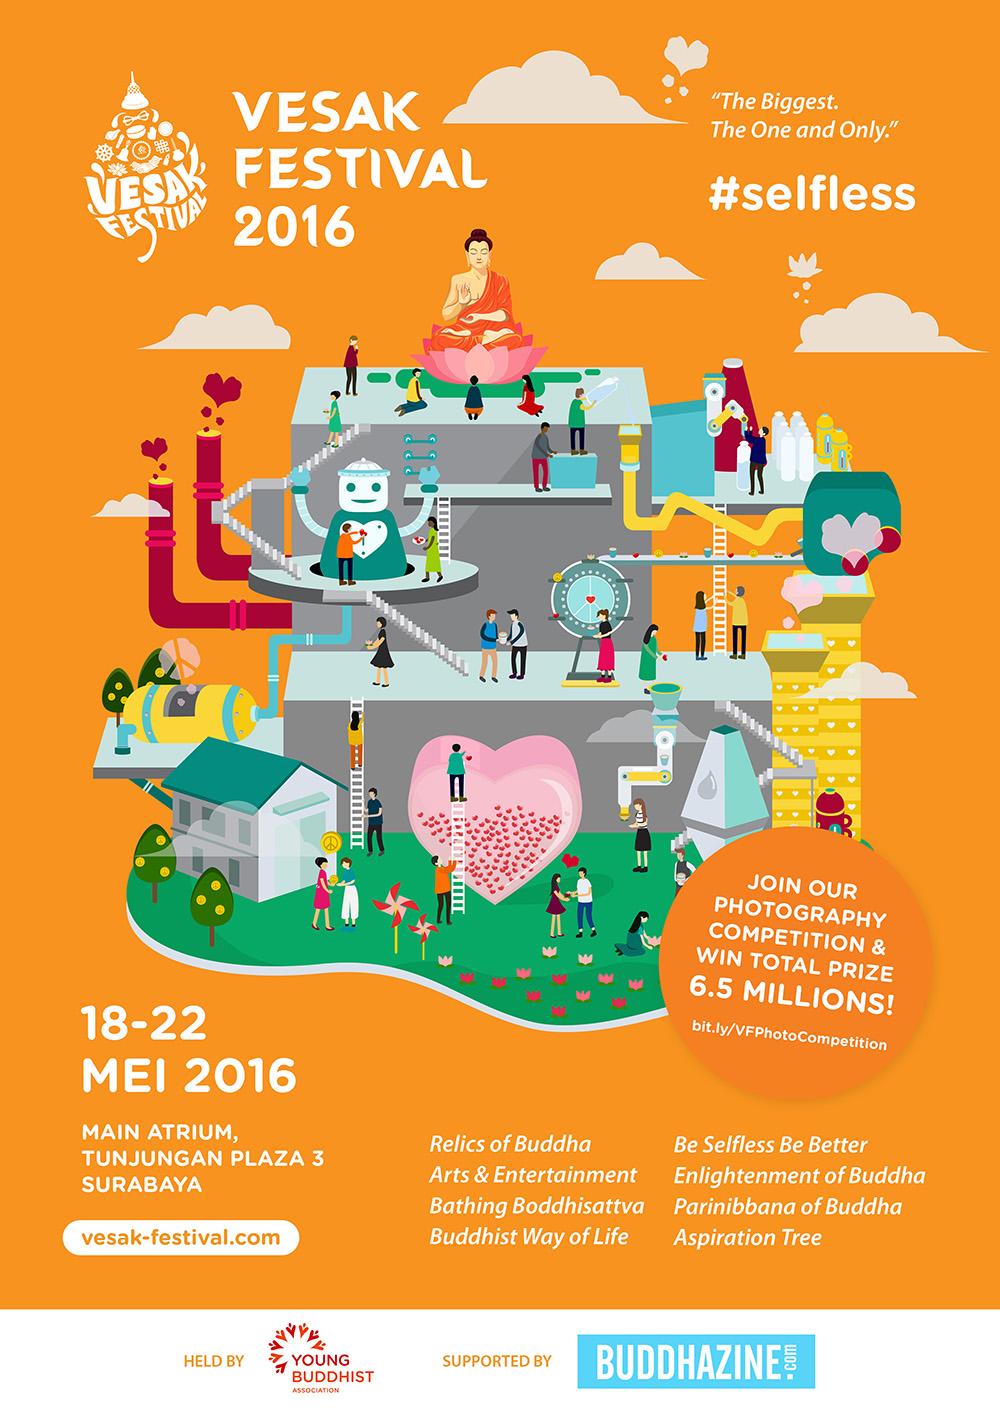 Vesak Festival 2016: SELFLESS